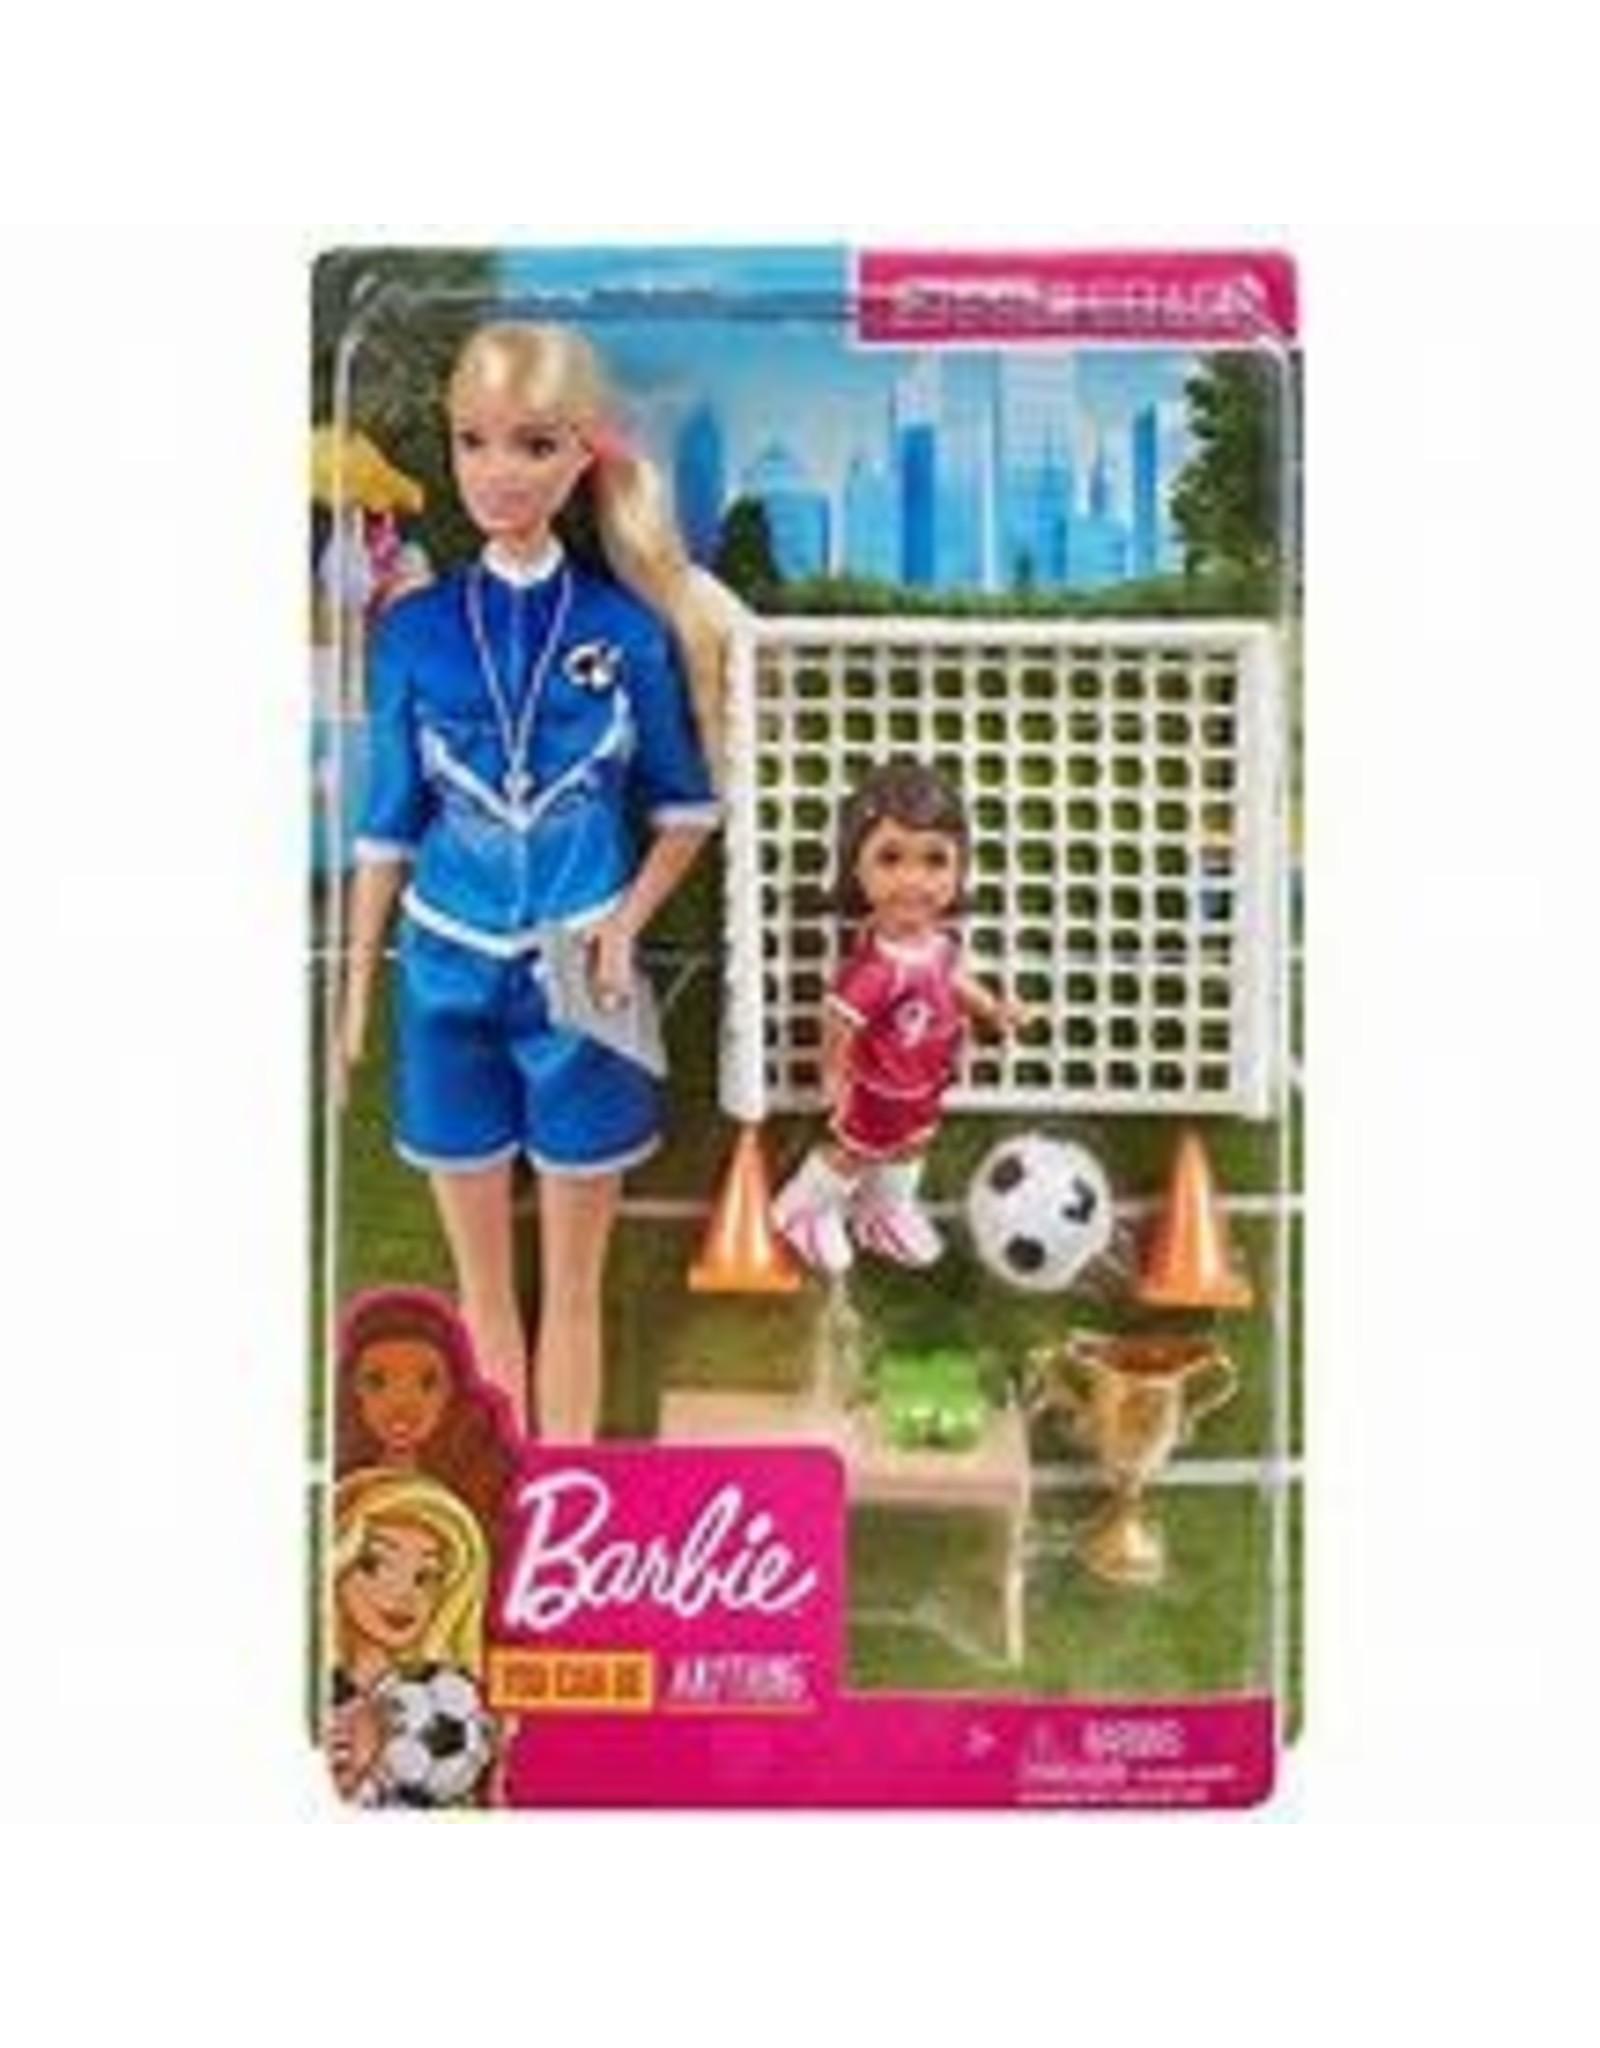 Barbie Barbie SCR Assortment